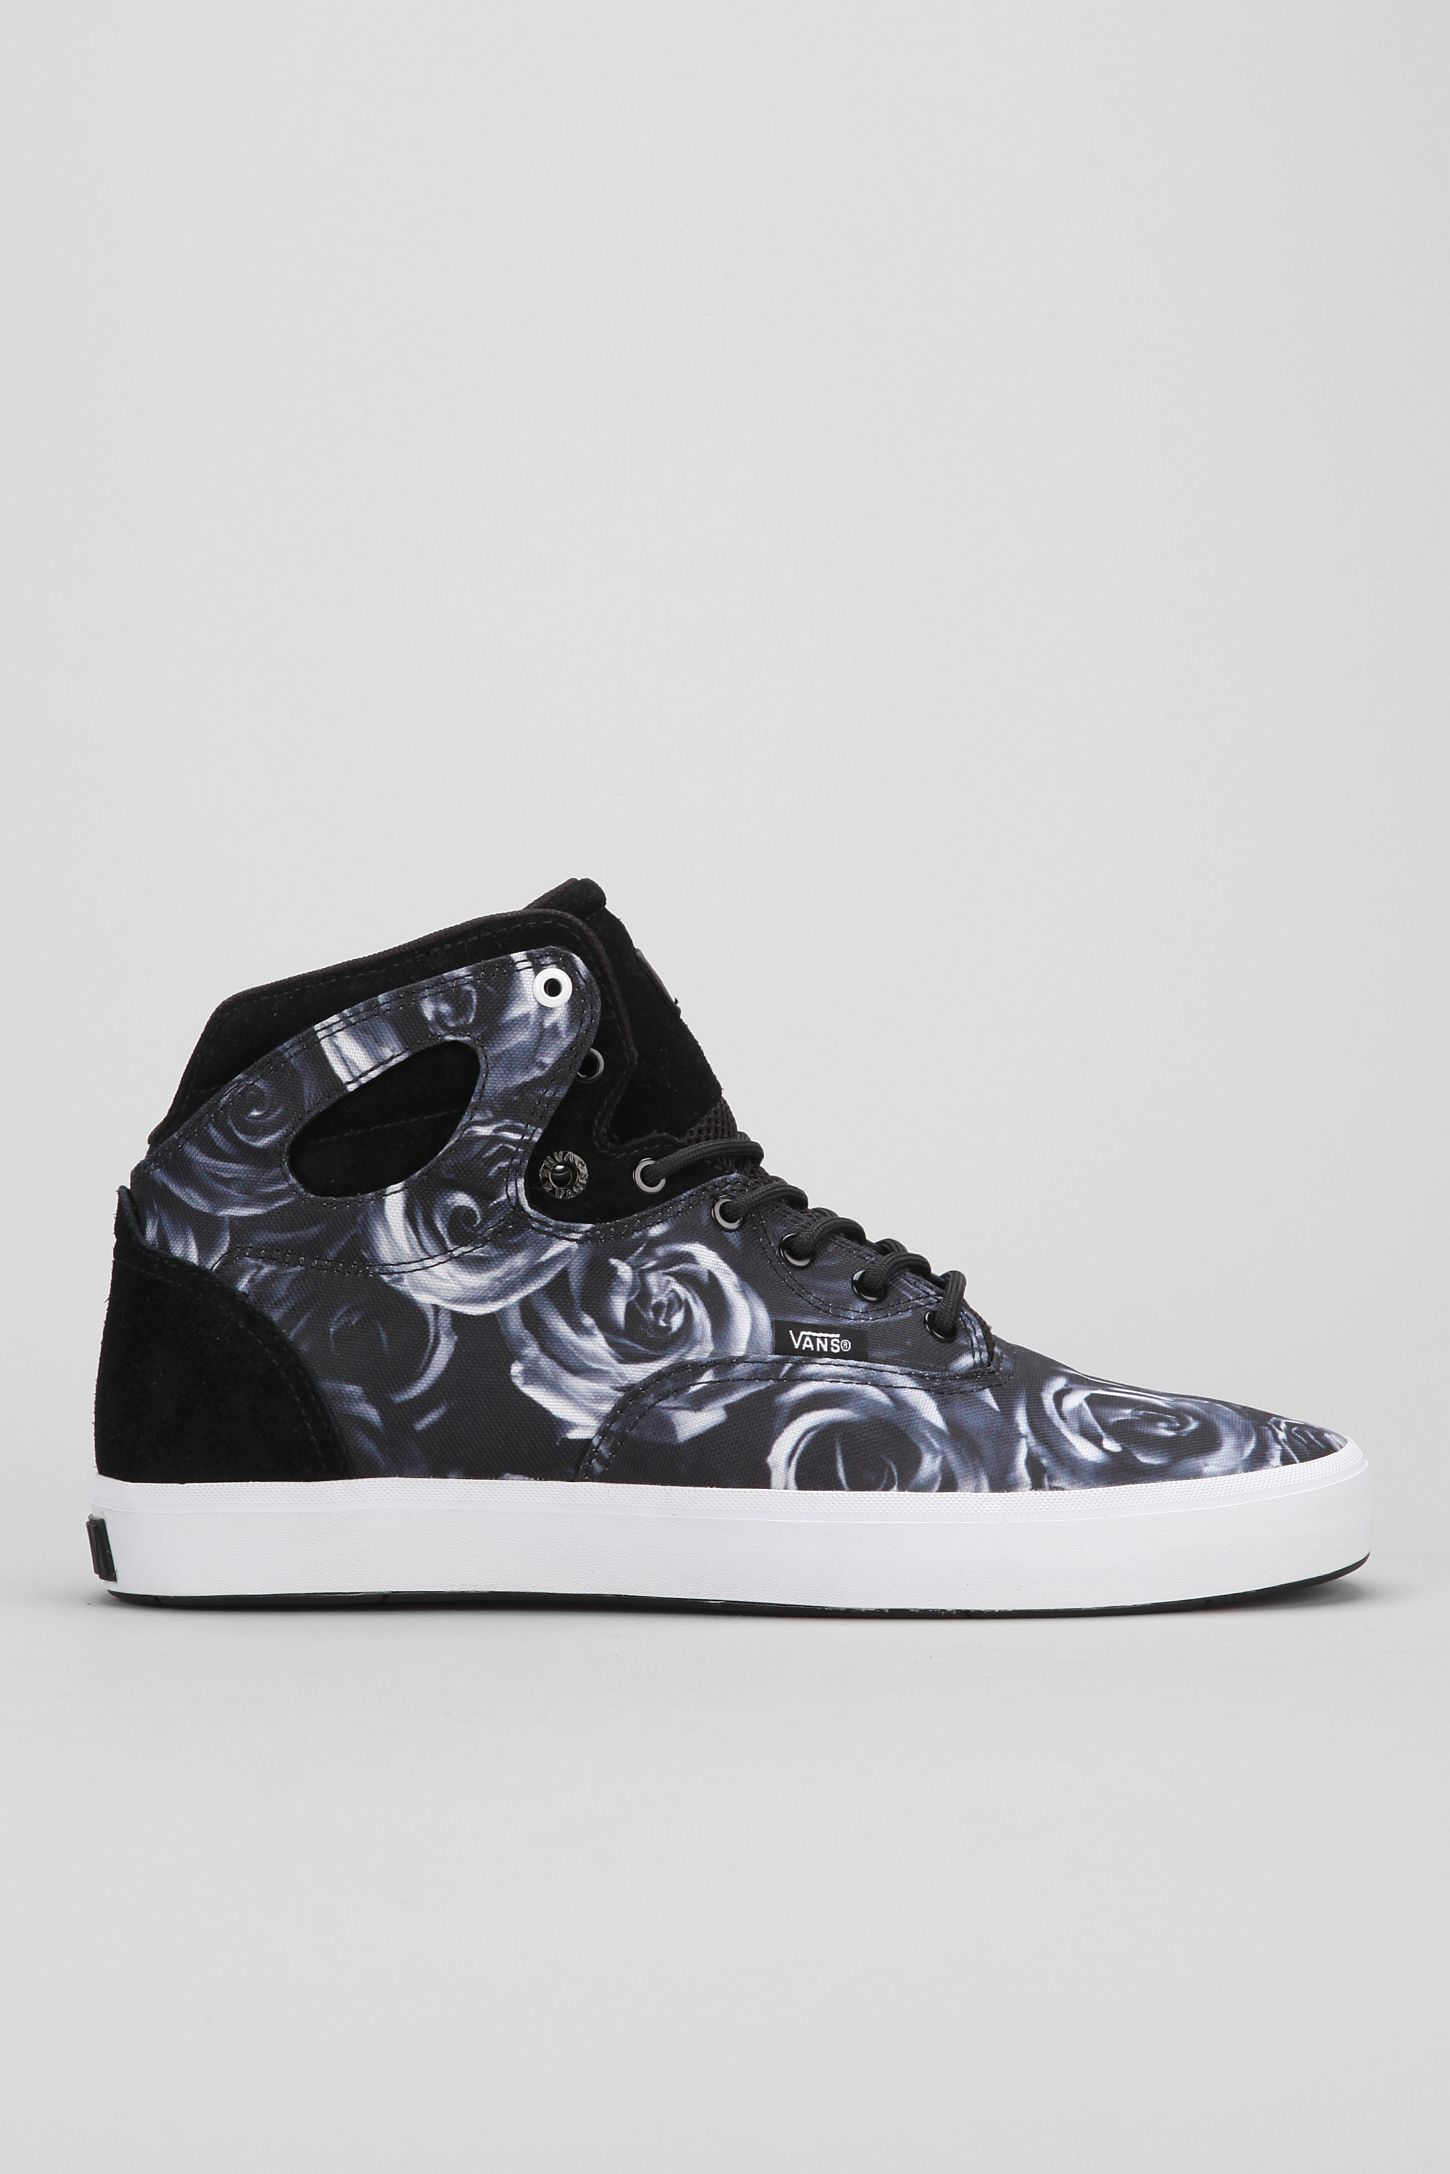 02c5242cd9 OTW By Vans Bushwick Rose Men s Sneaker